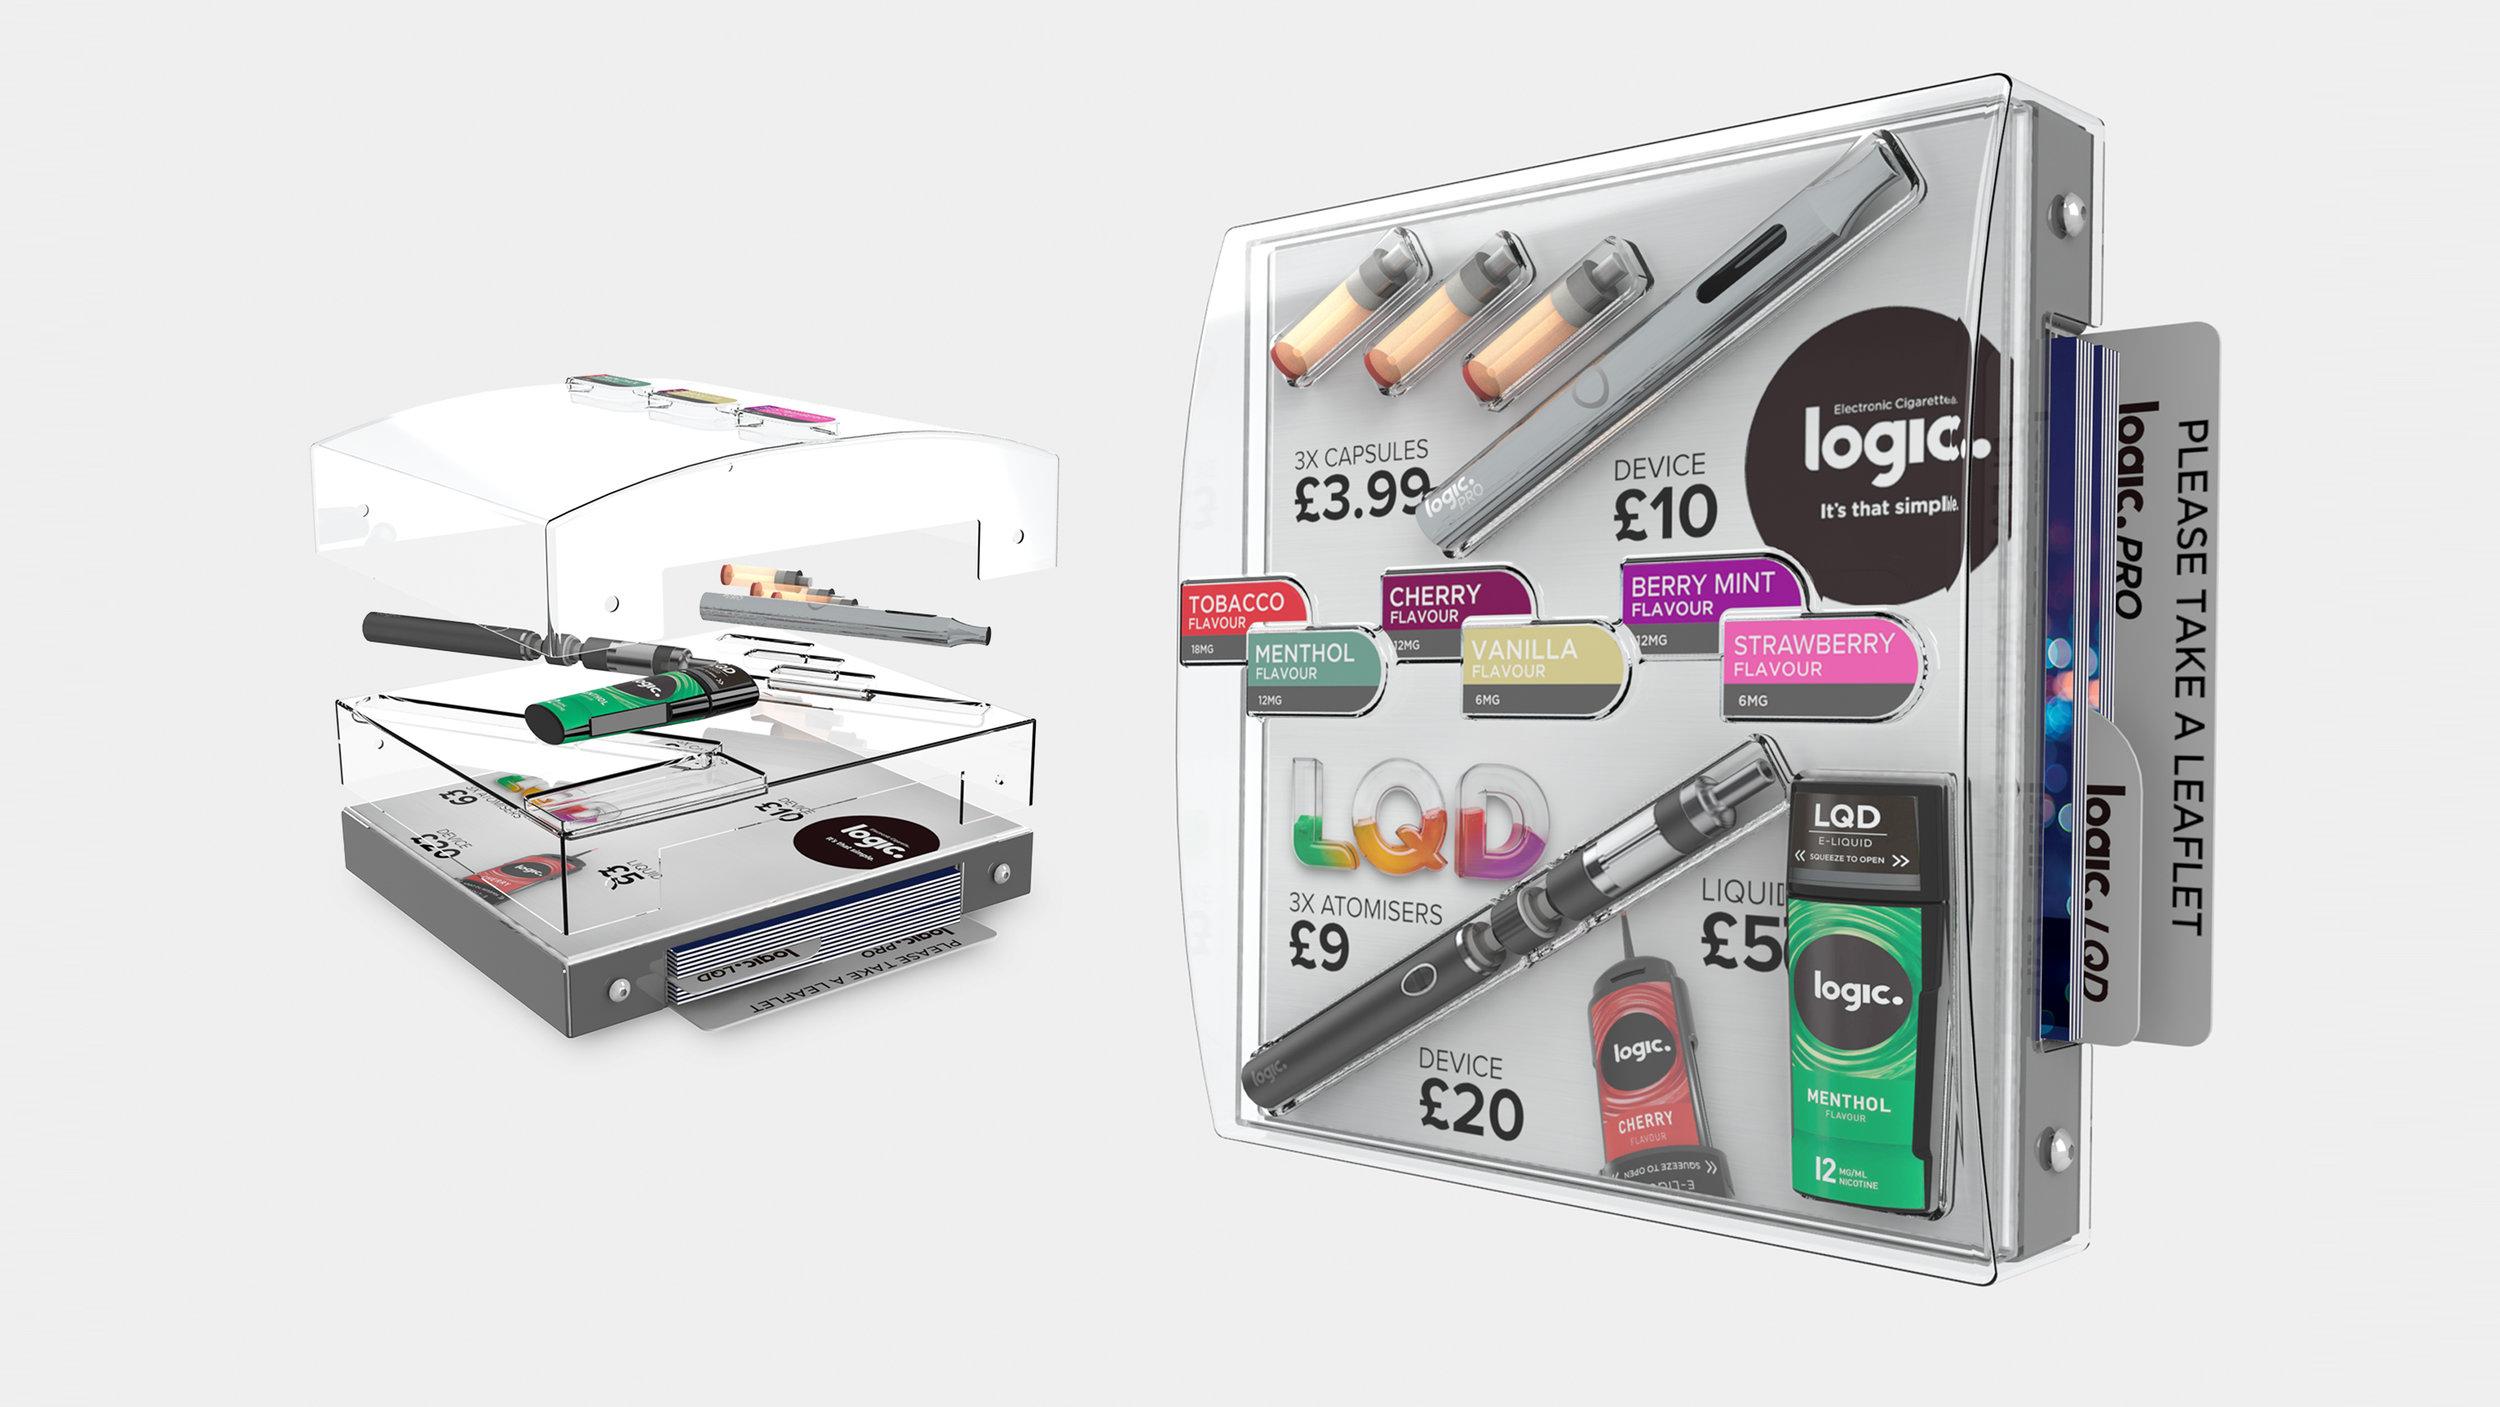 Logic Pro & Logic LQD Parasite Display Concept.